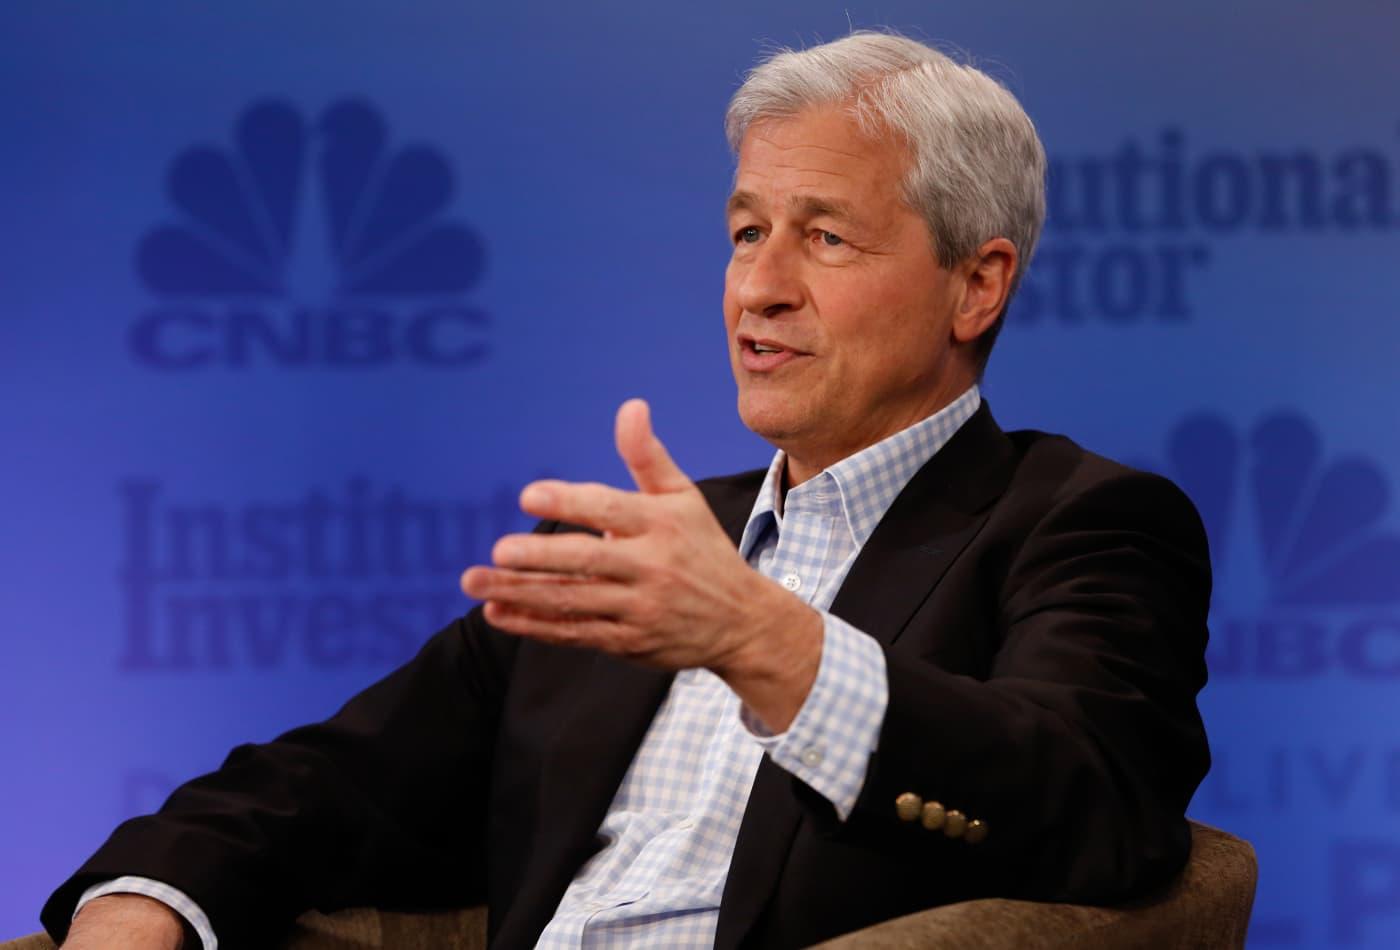 JPMorgan CEO Jamie Dimon prioritizes his job 'literally last'